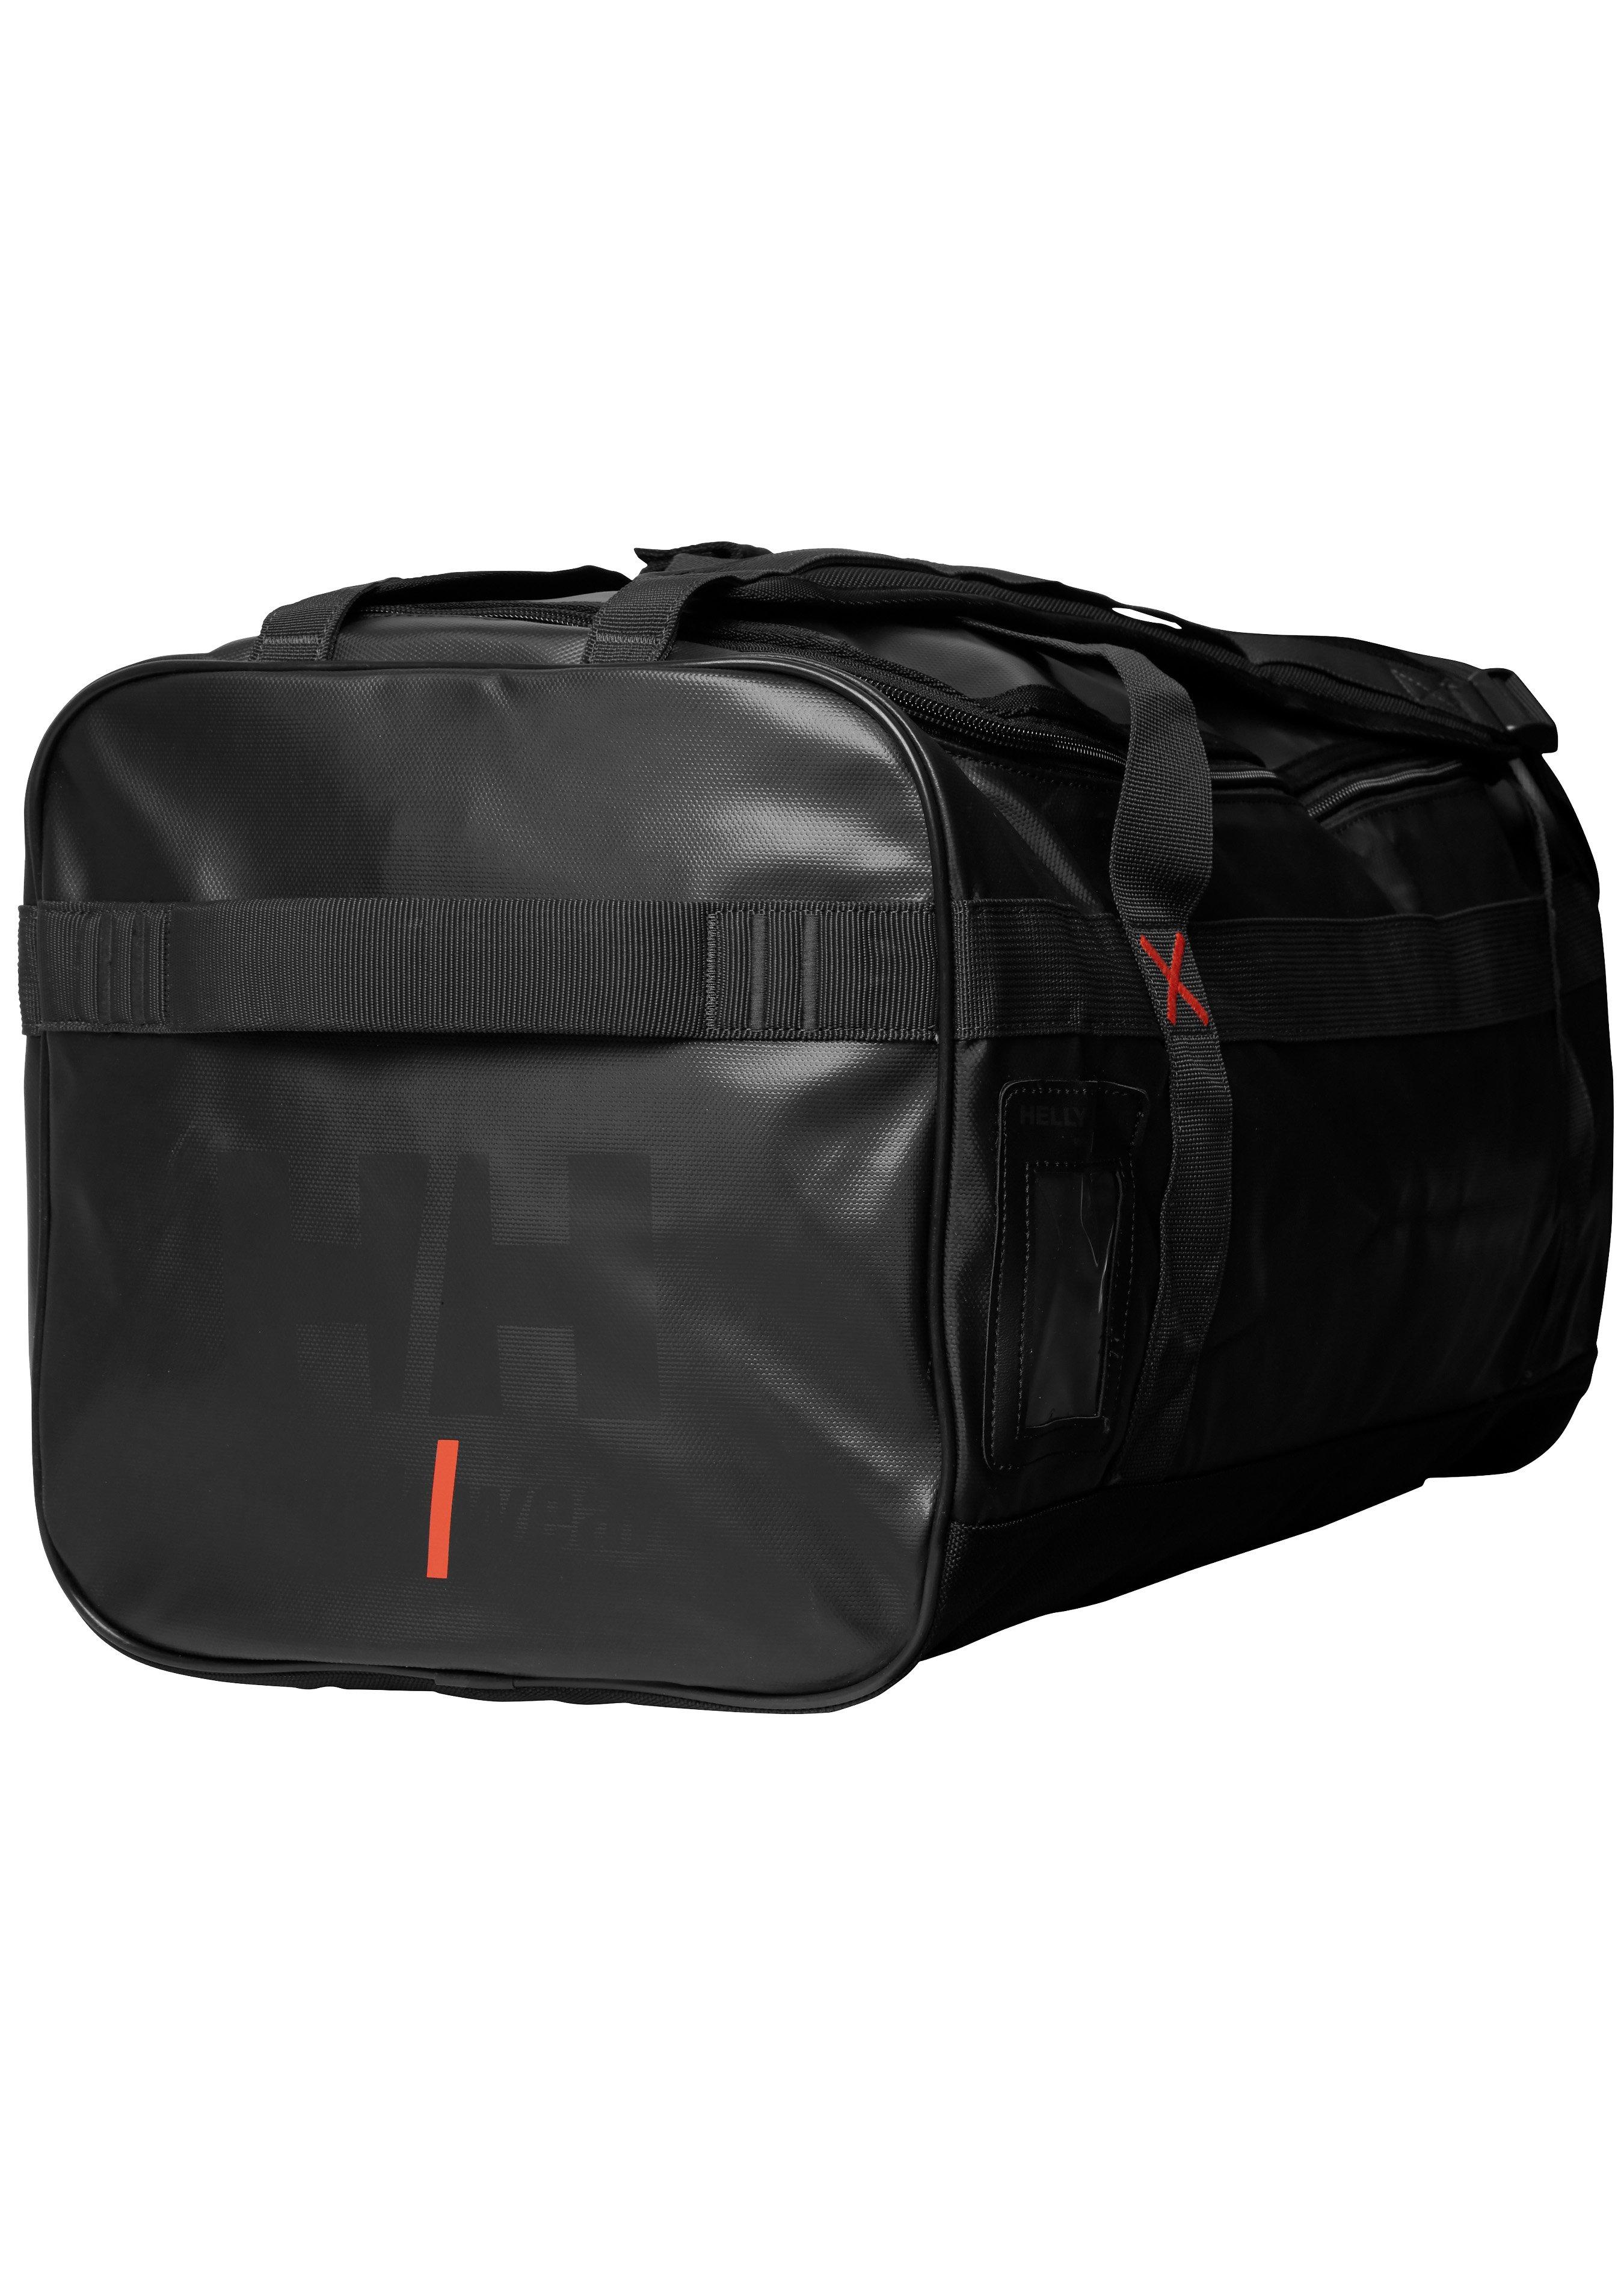 Helly Hansen Tasche Duffel Bag 90 Liter 288110 2